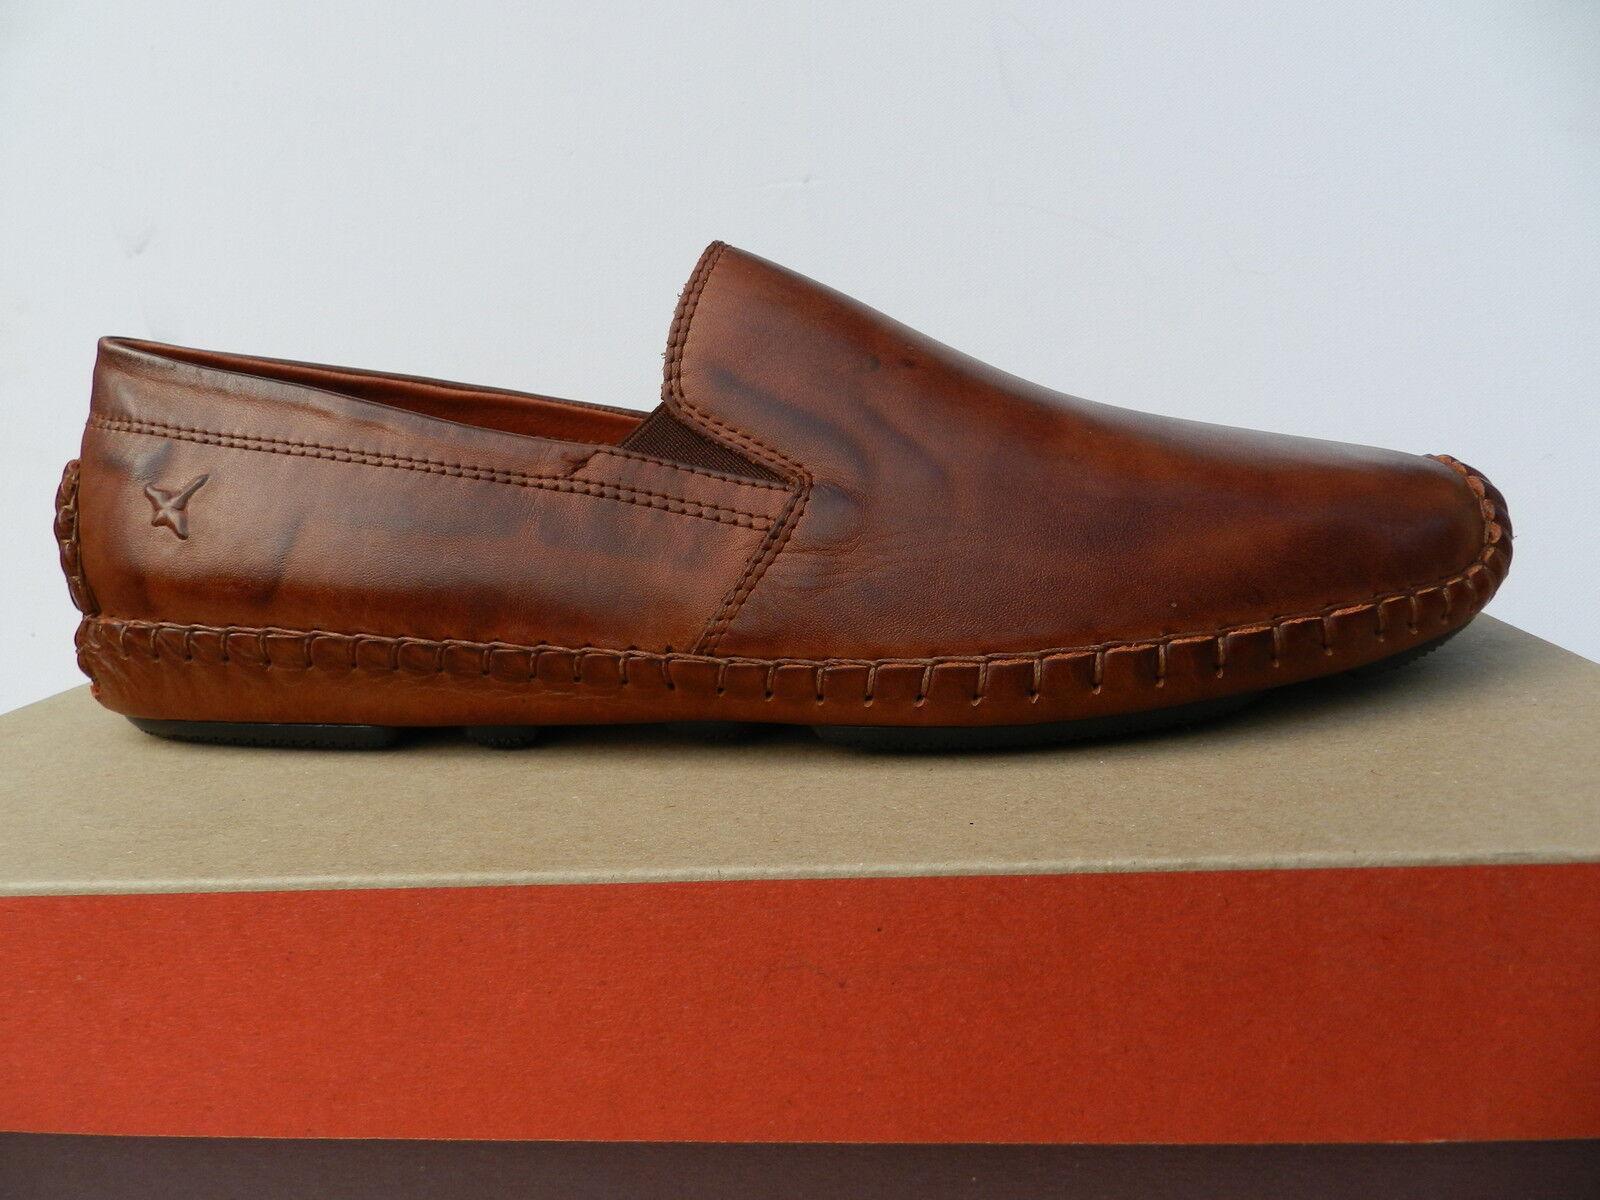 Pikolinos Jerez 09z 5511 shoes Homme 40 Mocassins Tan Slip on Derbies Neuf